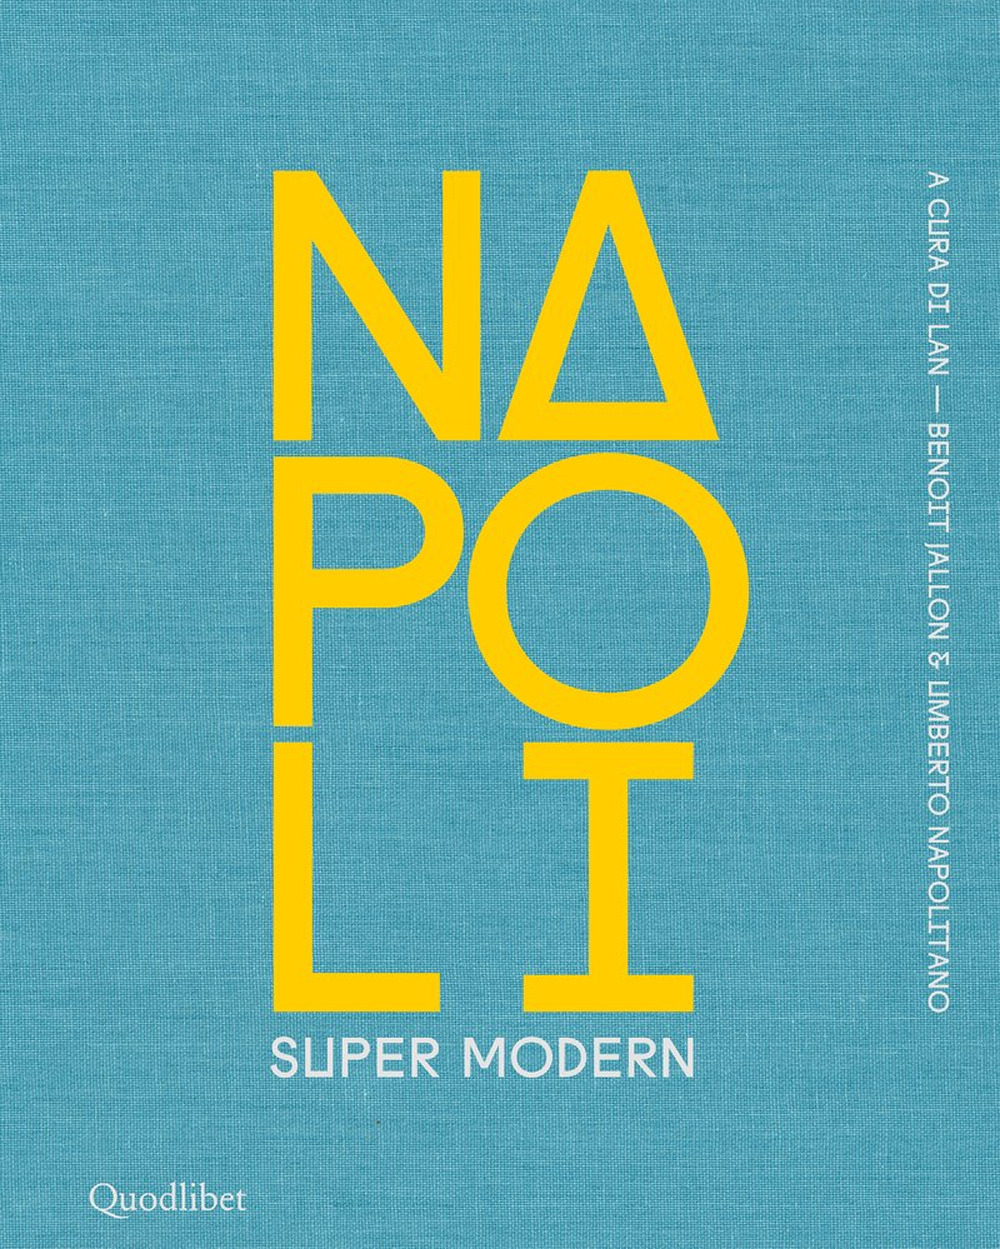 NAPOLI SUPER MODERN. EDIZ. ILLUSTRATA - LAN (Local Architecture Network) (cur.); Jallon B. (cur.); Napolitano U. (cur.) - 9788822905598